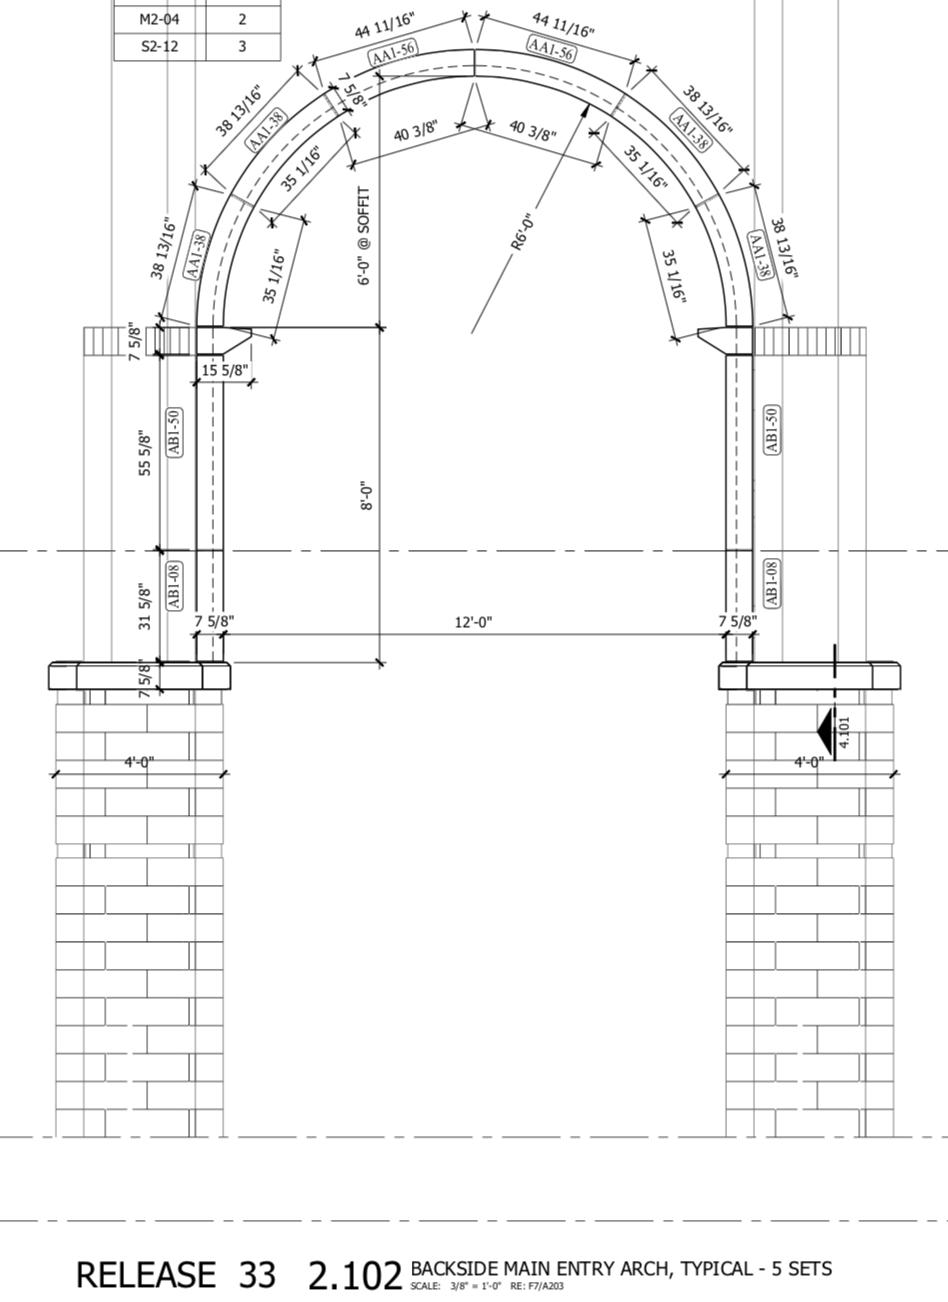 Lebanon High School Main Entry - Settings Plan - Backview